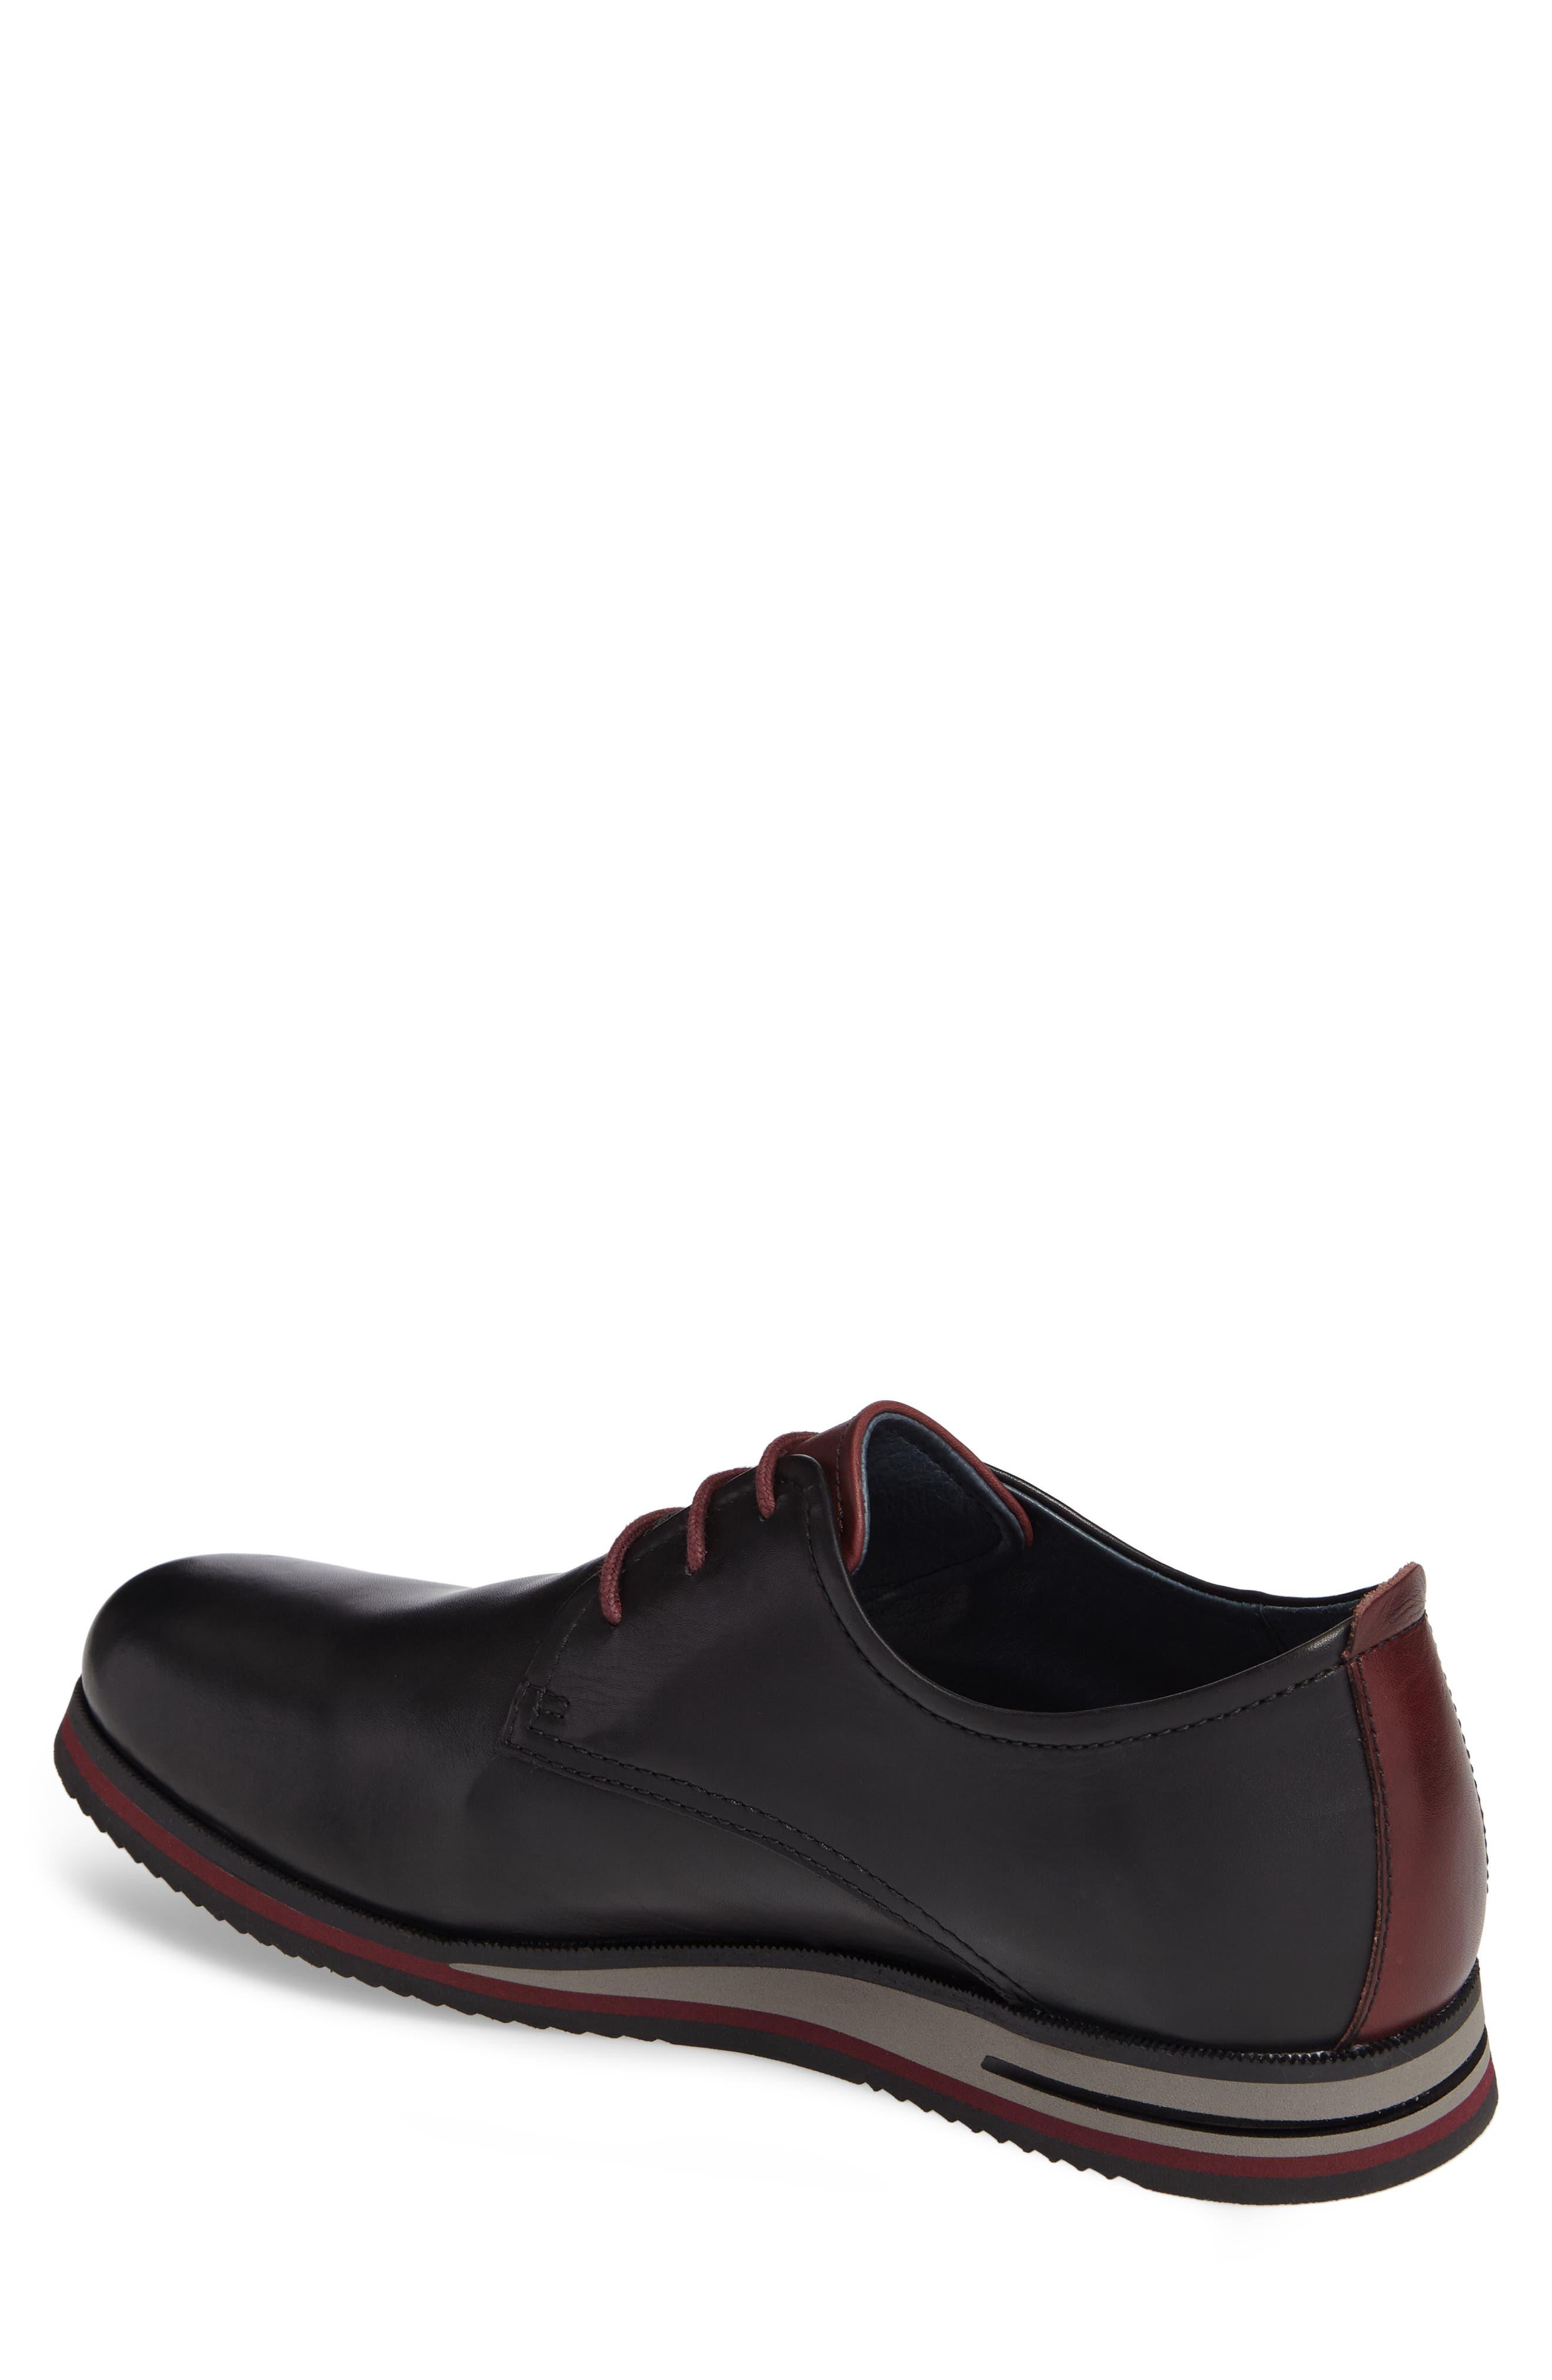 Alternate Image 2  - PIKOLINOS Leox Plain Toe Derby (Men)